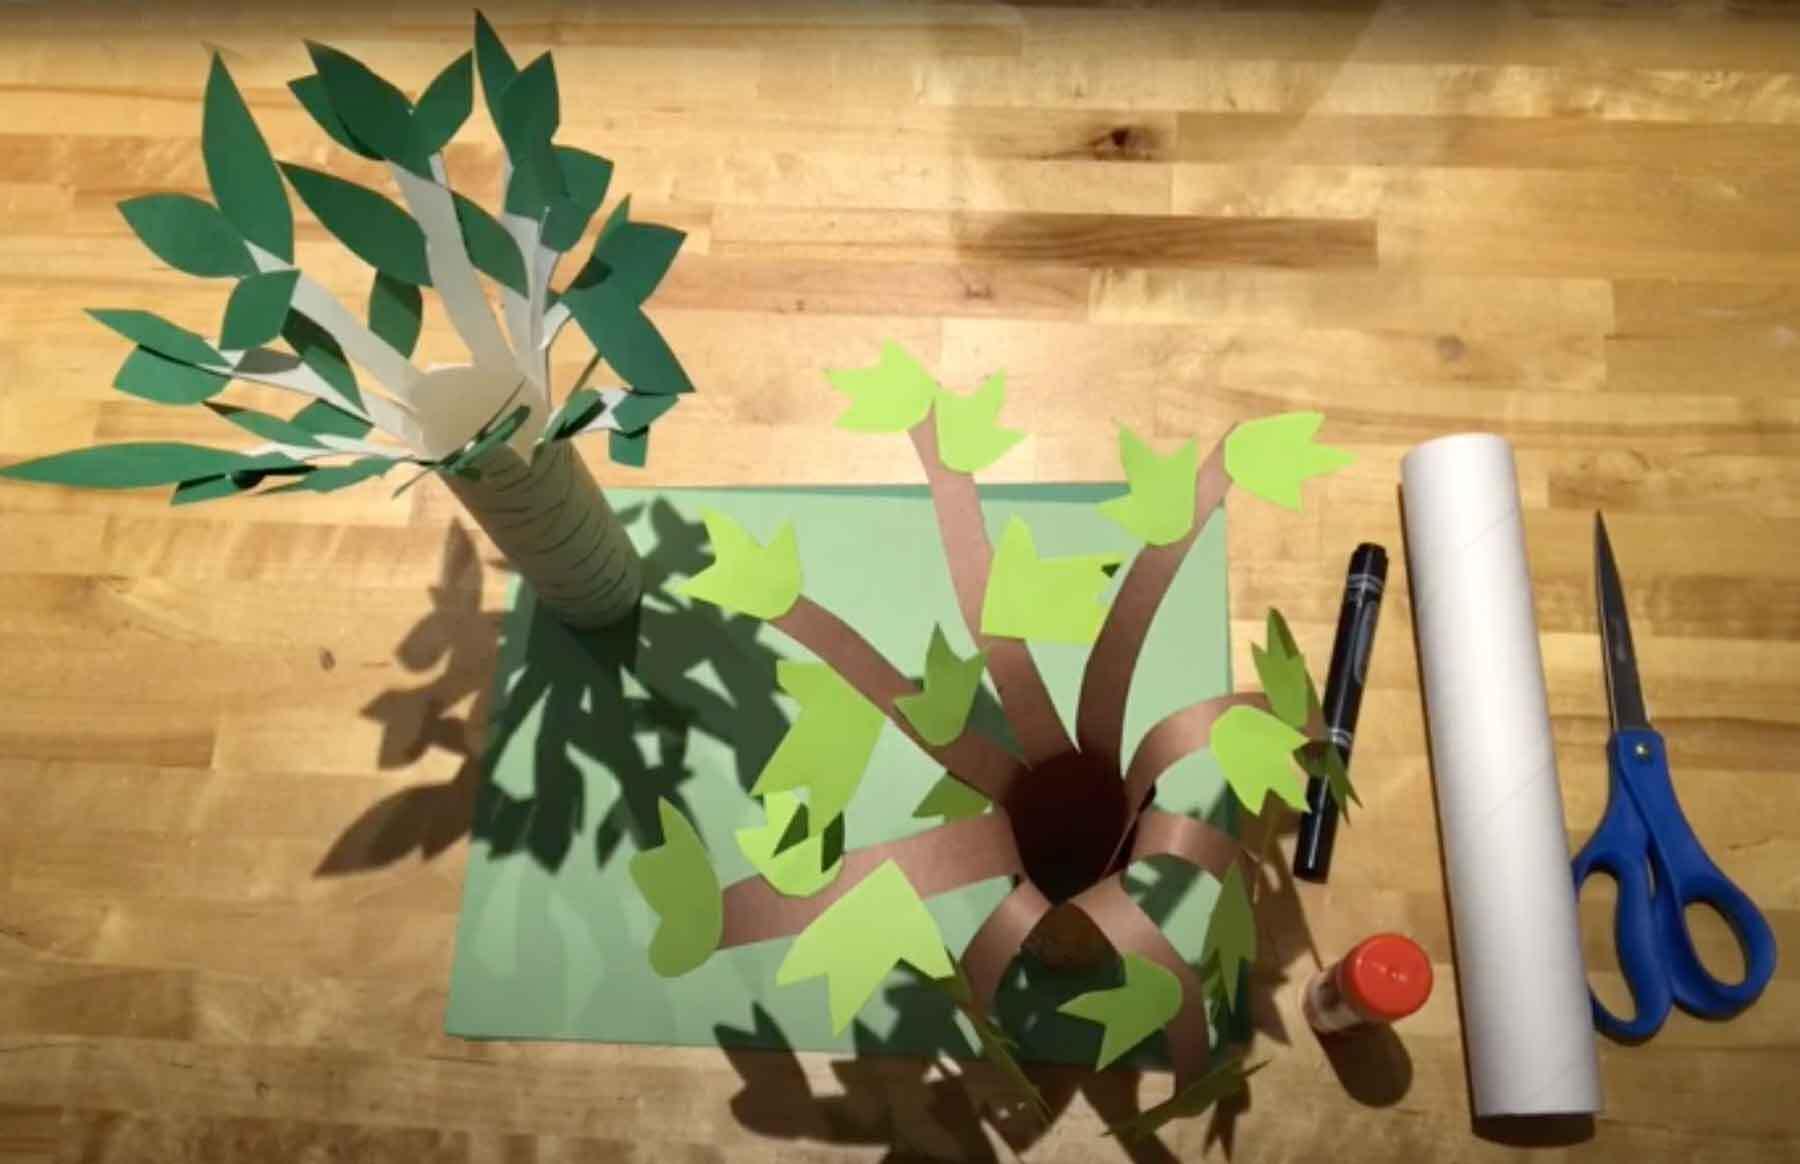 Arbor Day tube trees drop-in art activity